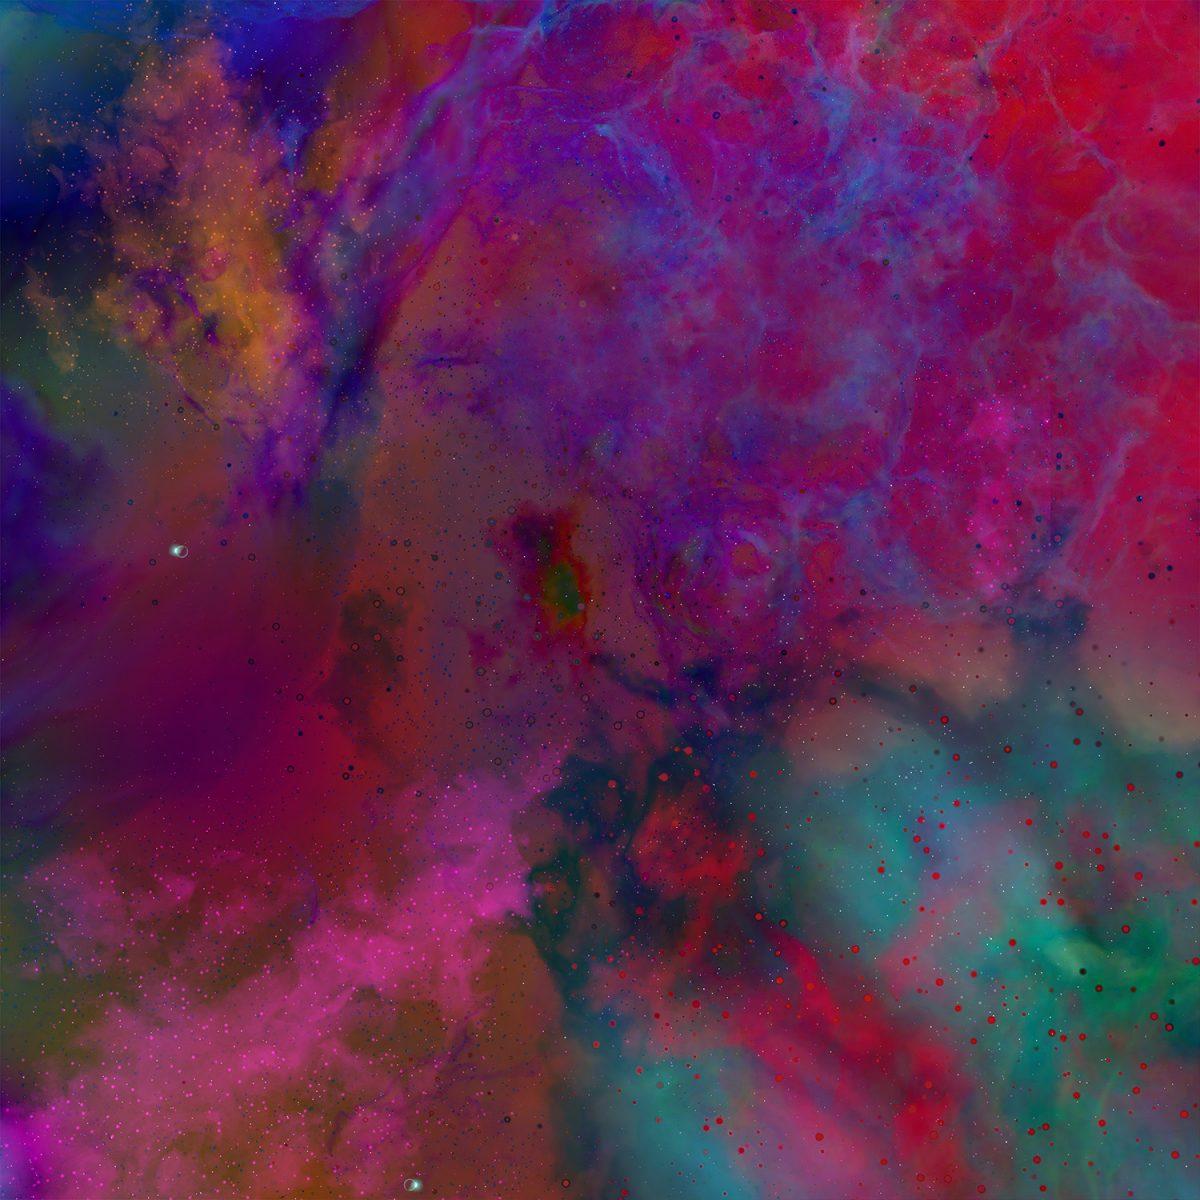 Space illustration Nebula